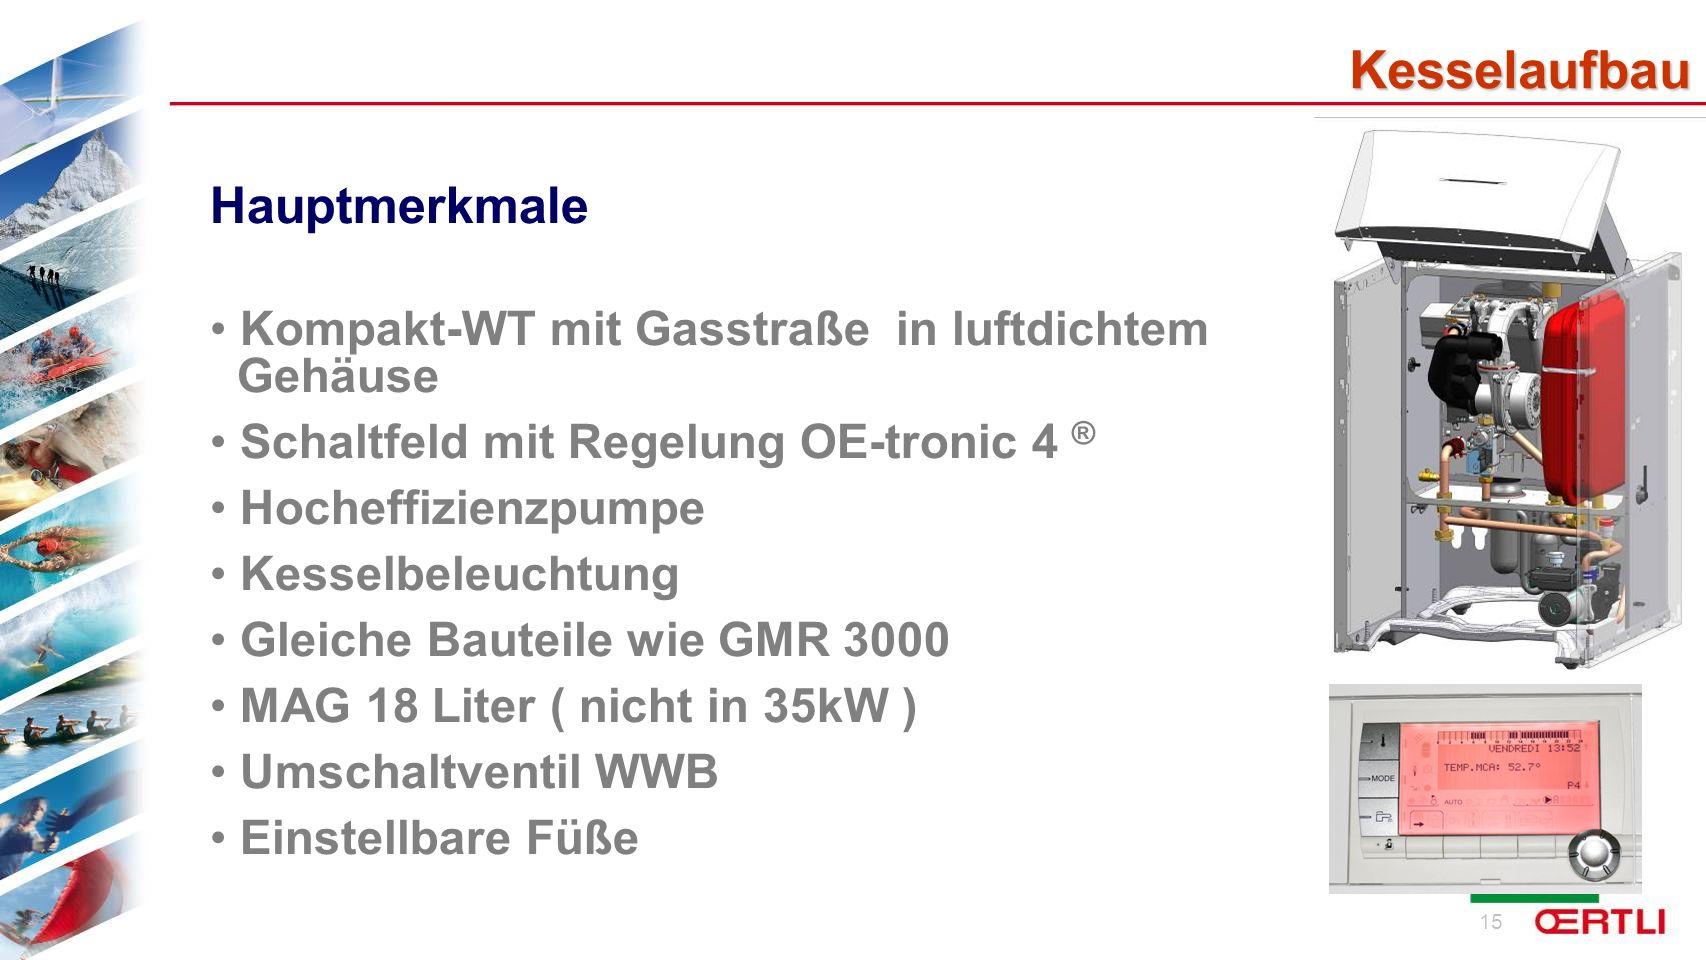 16 Kesselaufbau Hauptmerkmale Verriegelte Kesseltür wg.